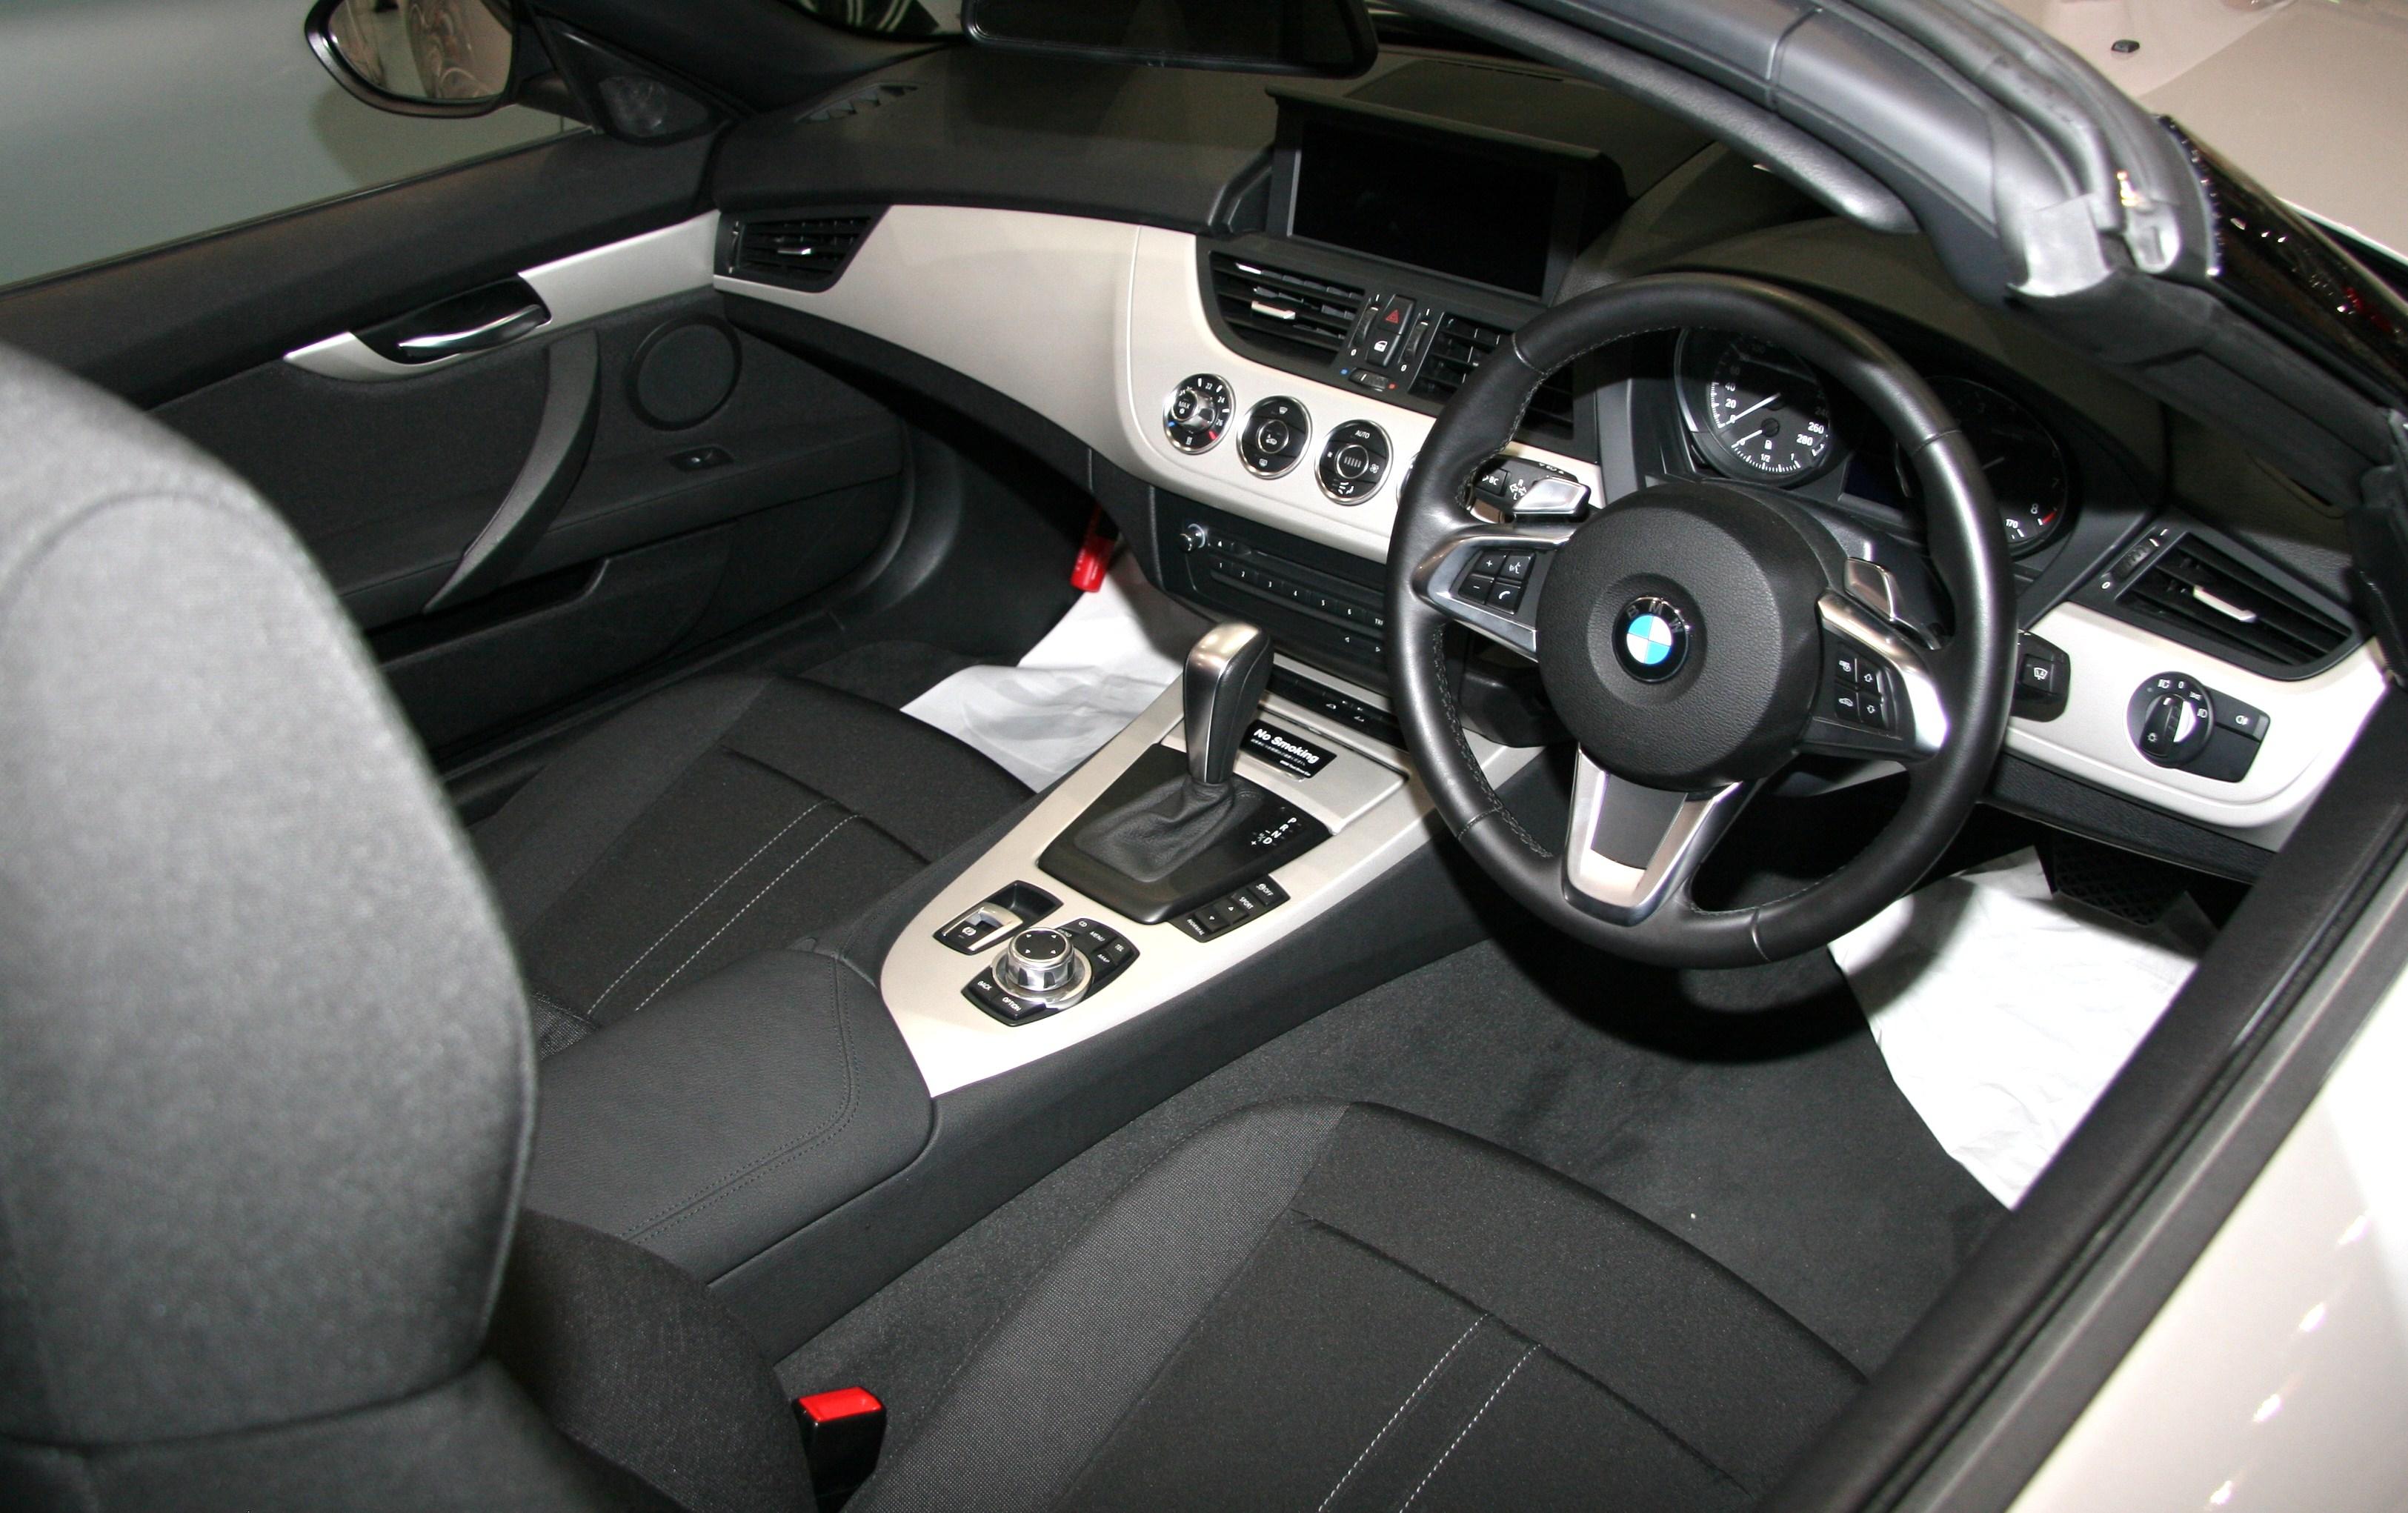 File:BMW Z4 E89 interior.jpg - Wikimedia Commons